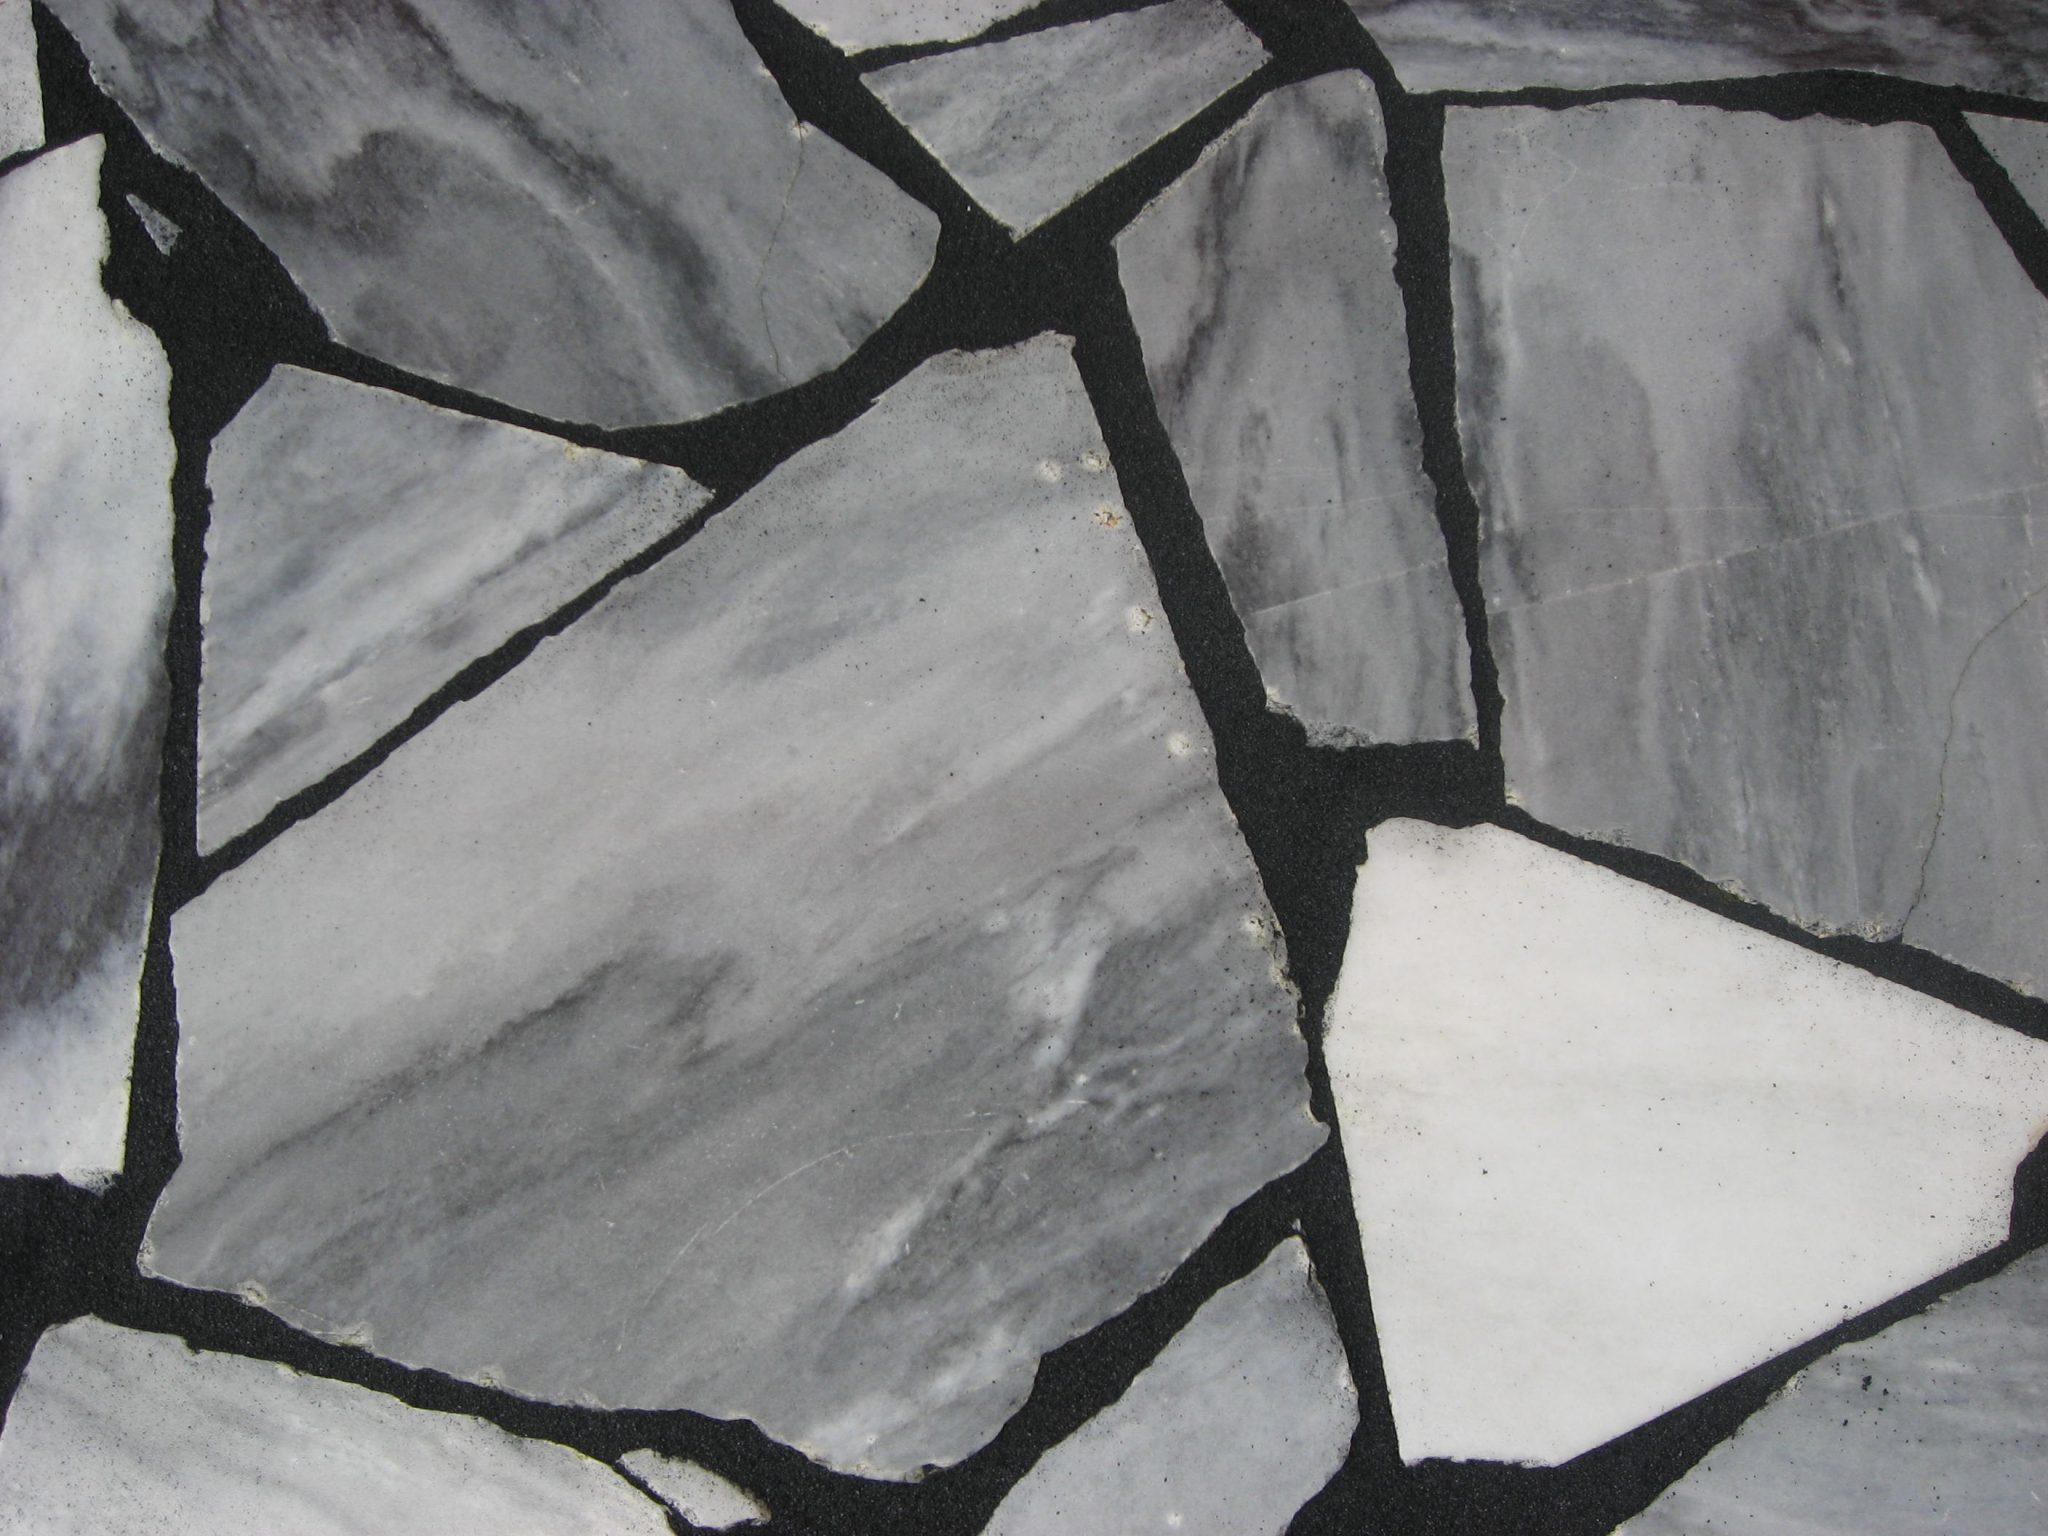 Detailfoto (16)